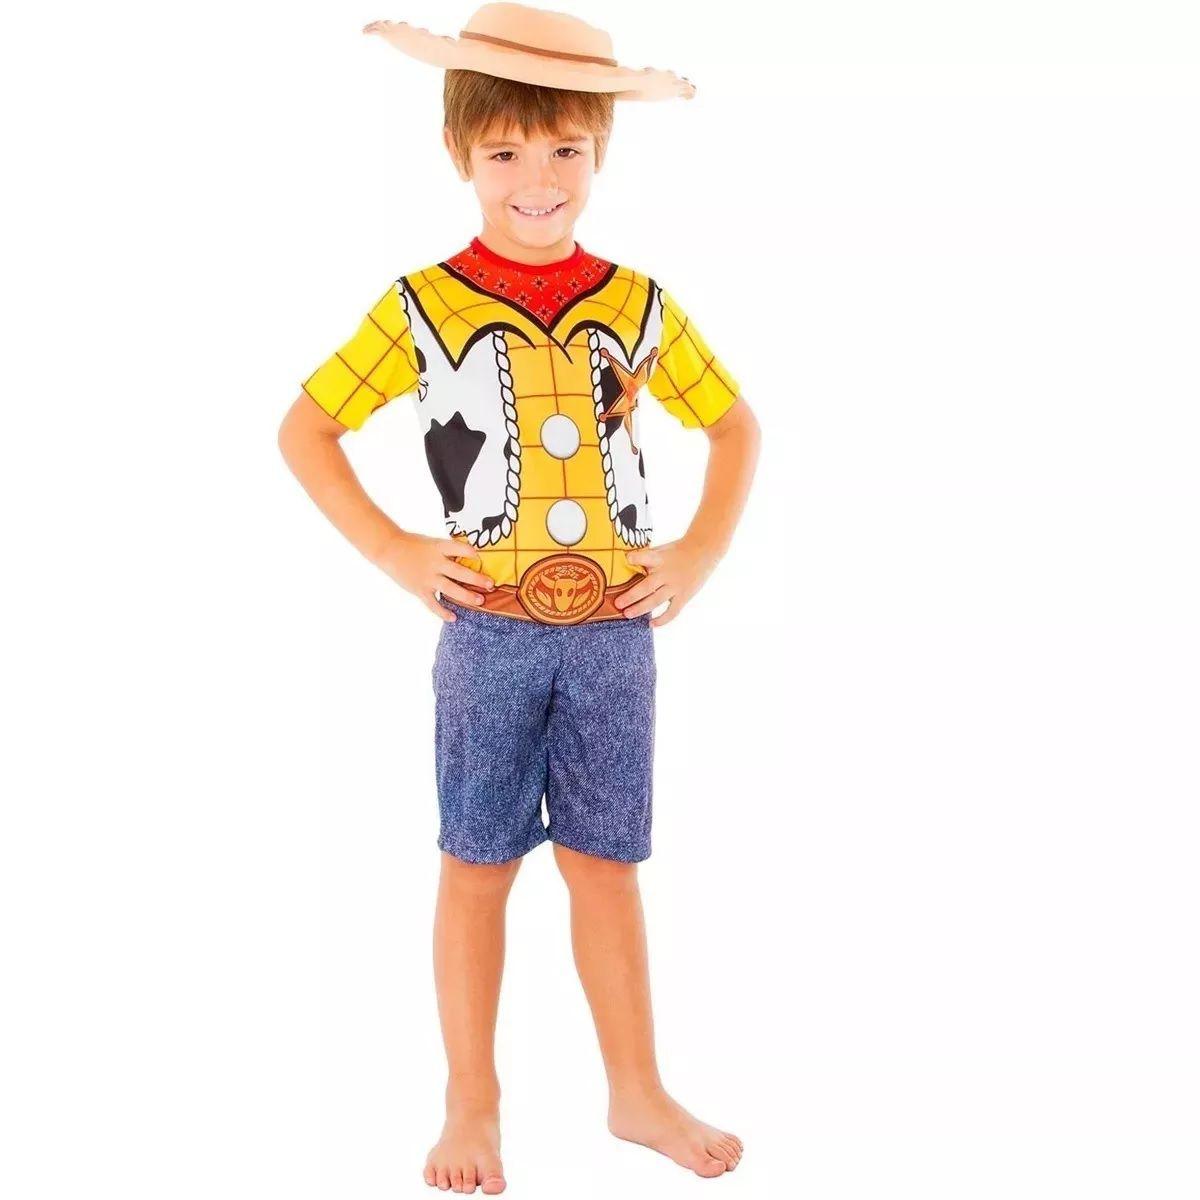 Fantasia Woody Infantil Toy Story Com Chapéu Original Disney Global 0434 eb3f0cf19de